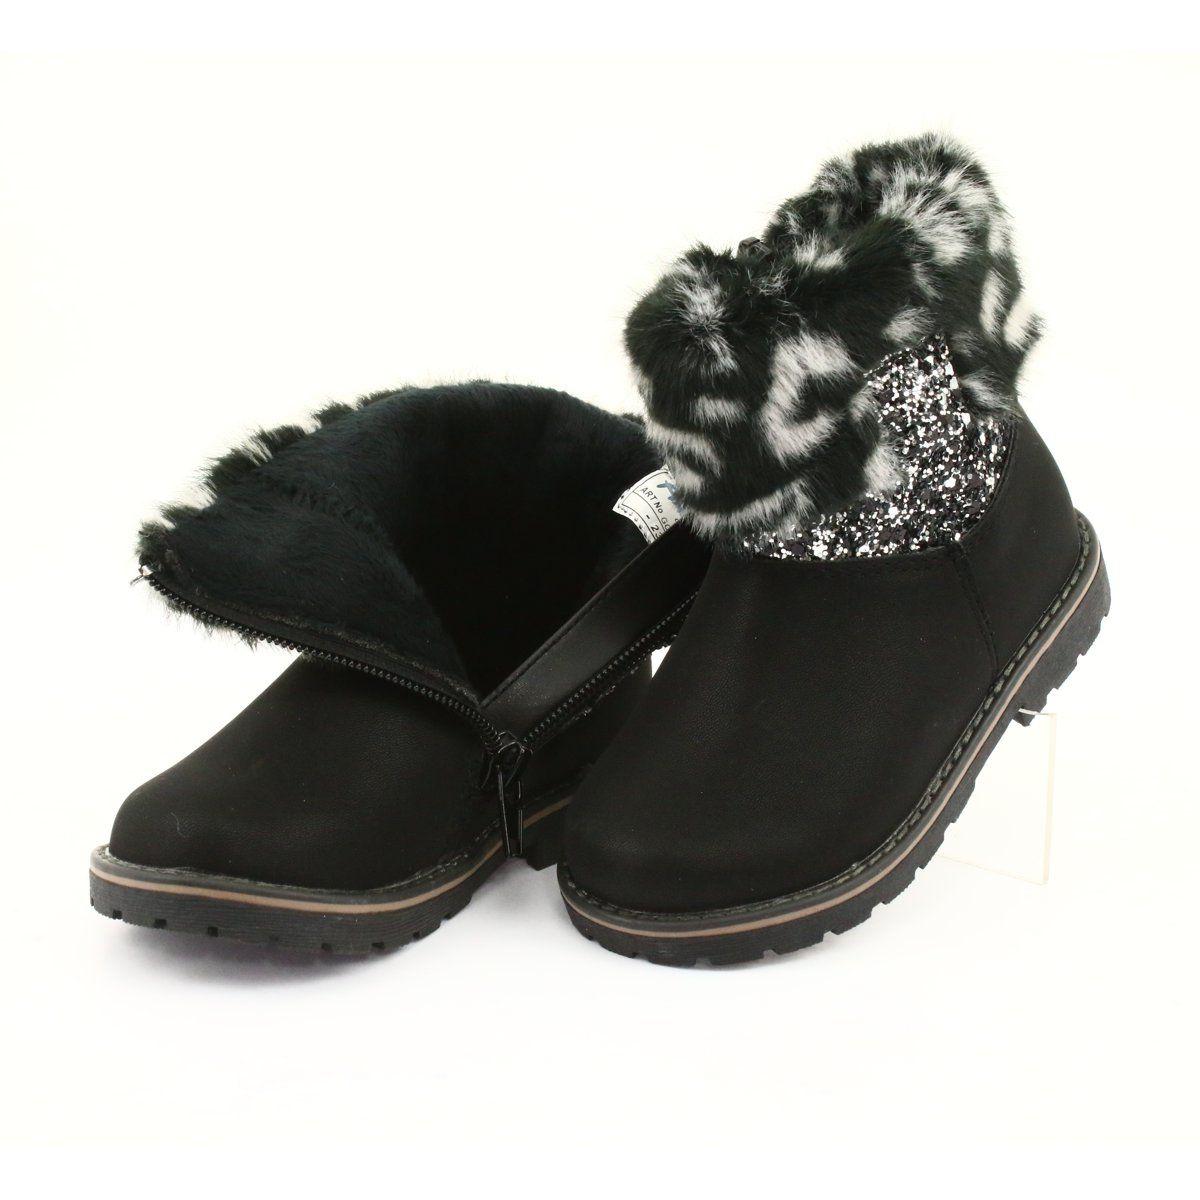 American Club Kozaczki Dziewczece American Gc45 Czarne Girls Black Boots Boots Black Boots